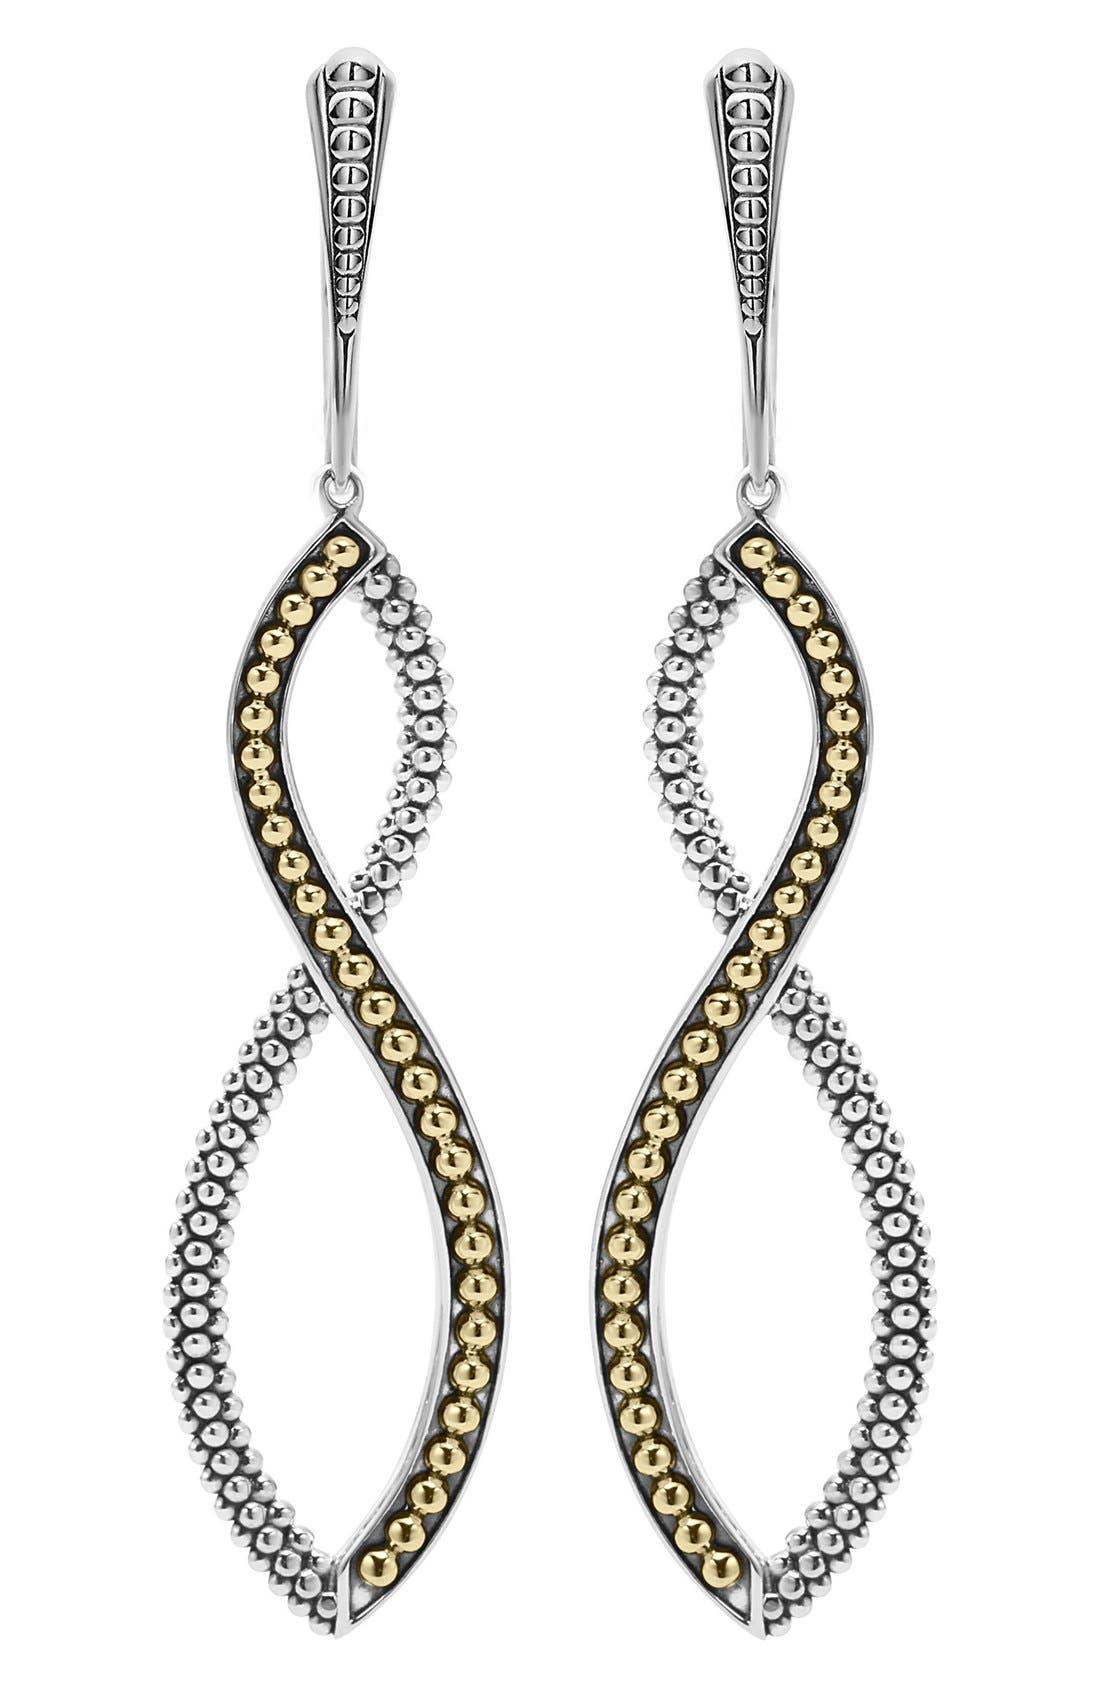 Infinity Twist Drop Earrings,                         Main,                         color, Silver/ Gold